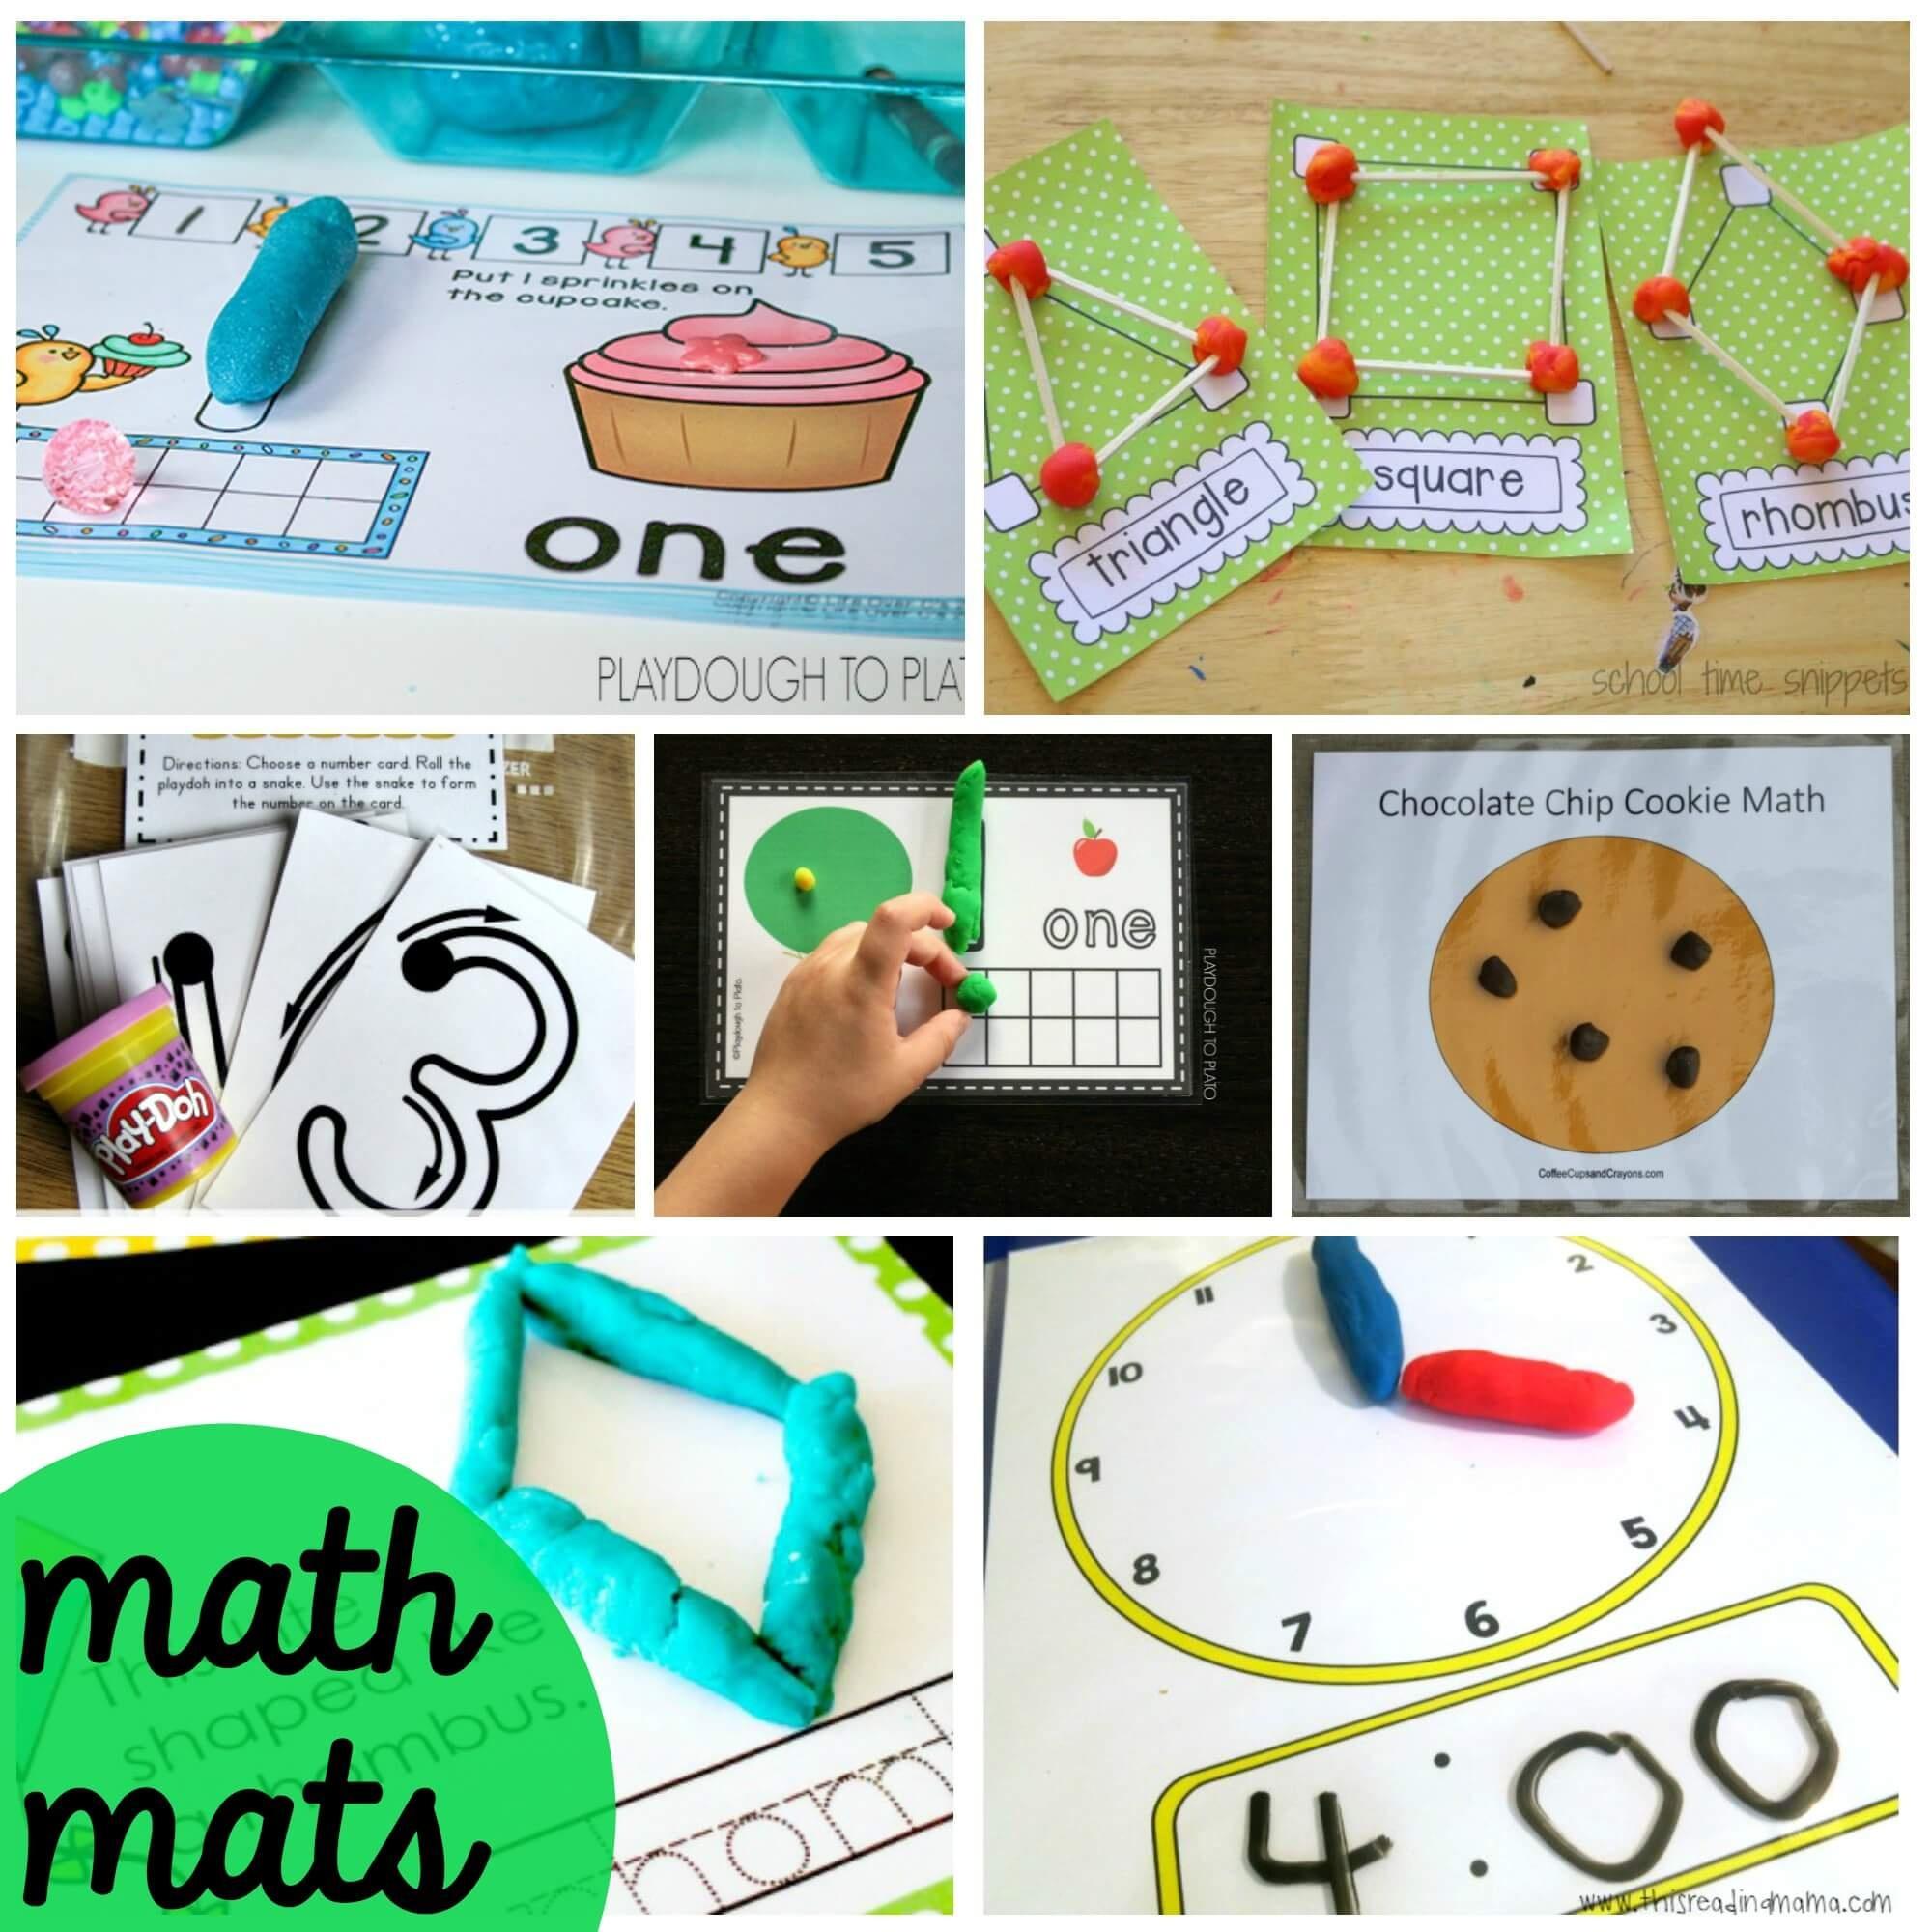 100 Free Playdough Mats - Playdough To Plato - Alphabet Playdough Mats Free Printable